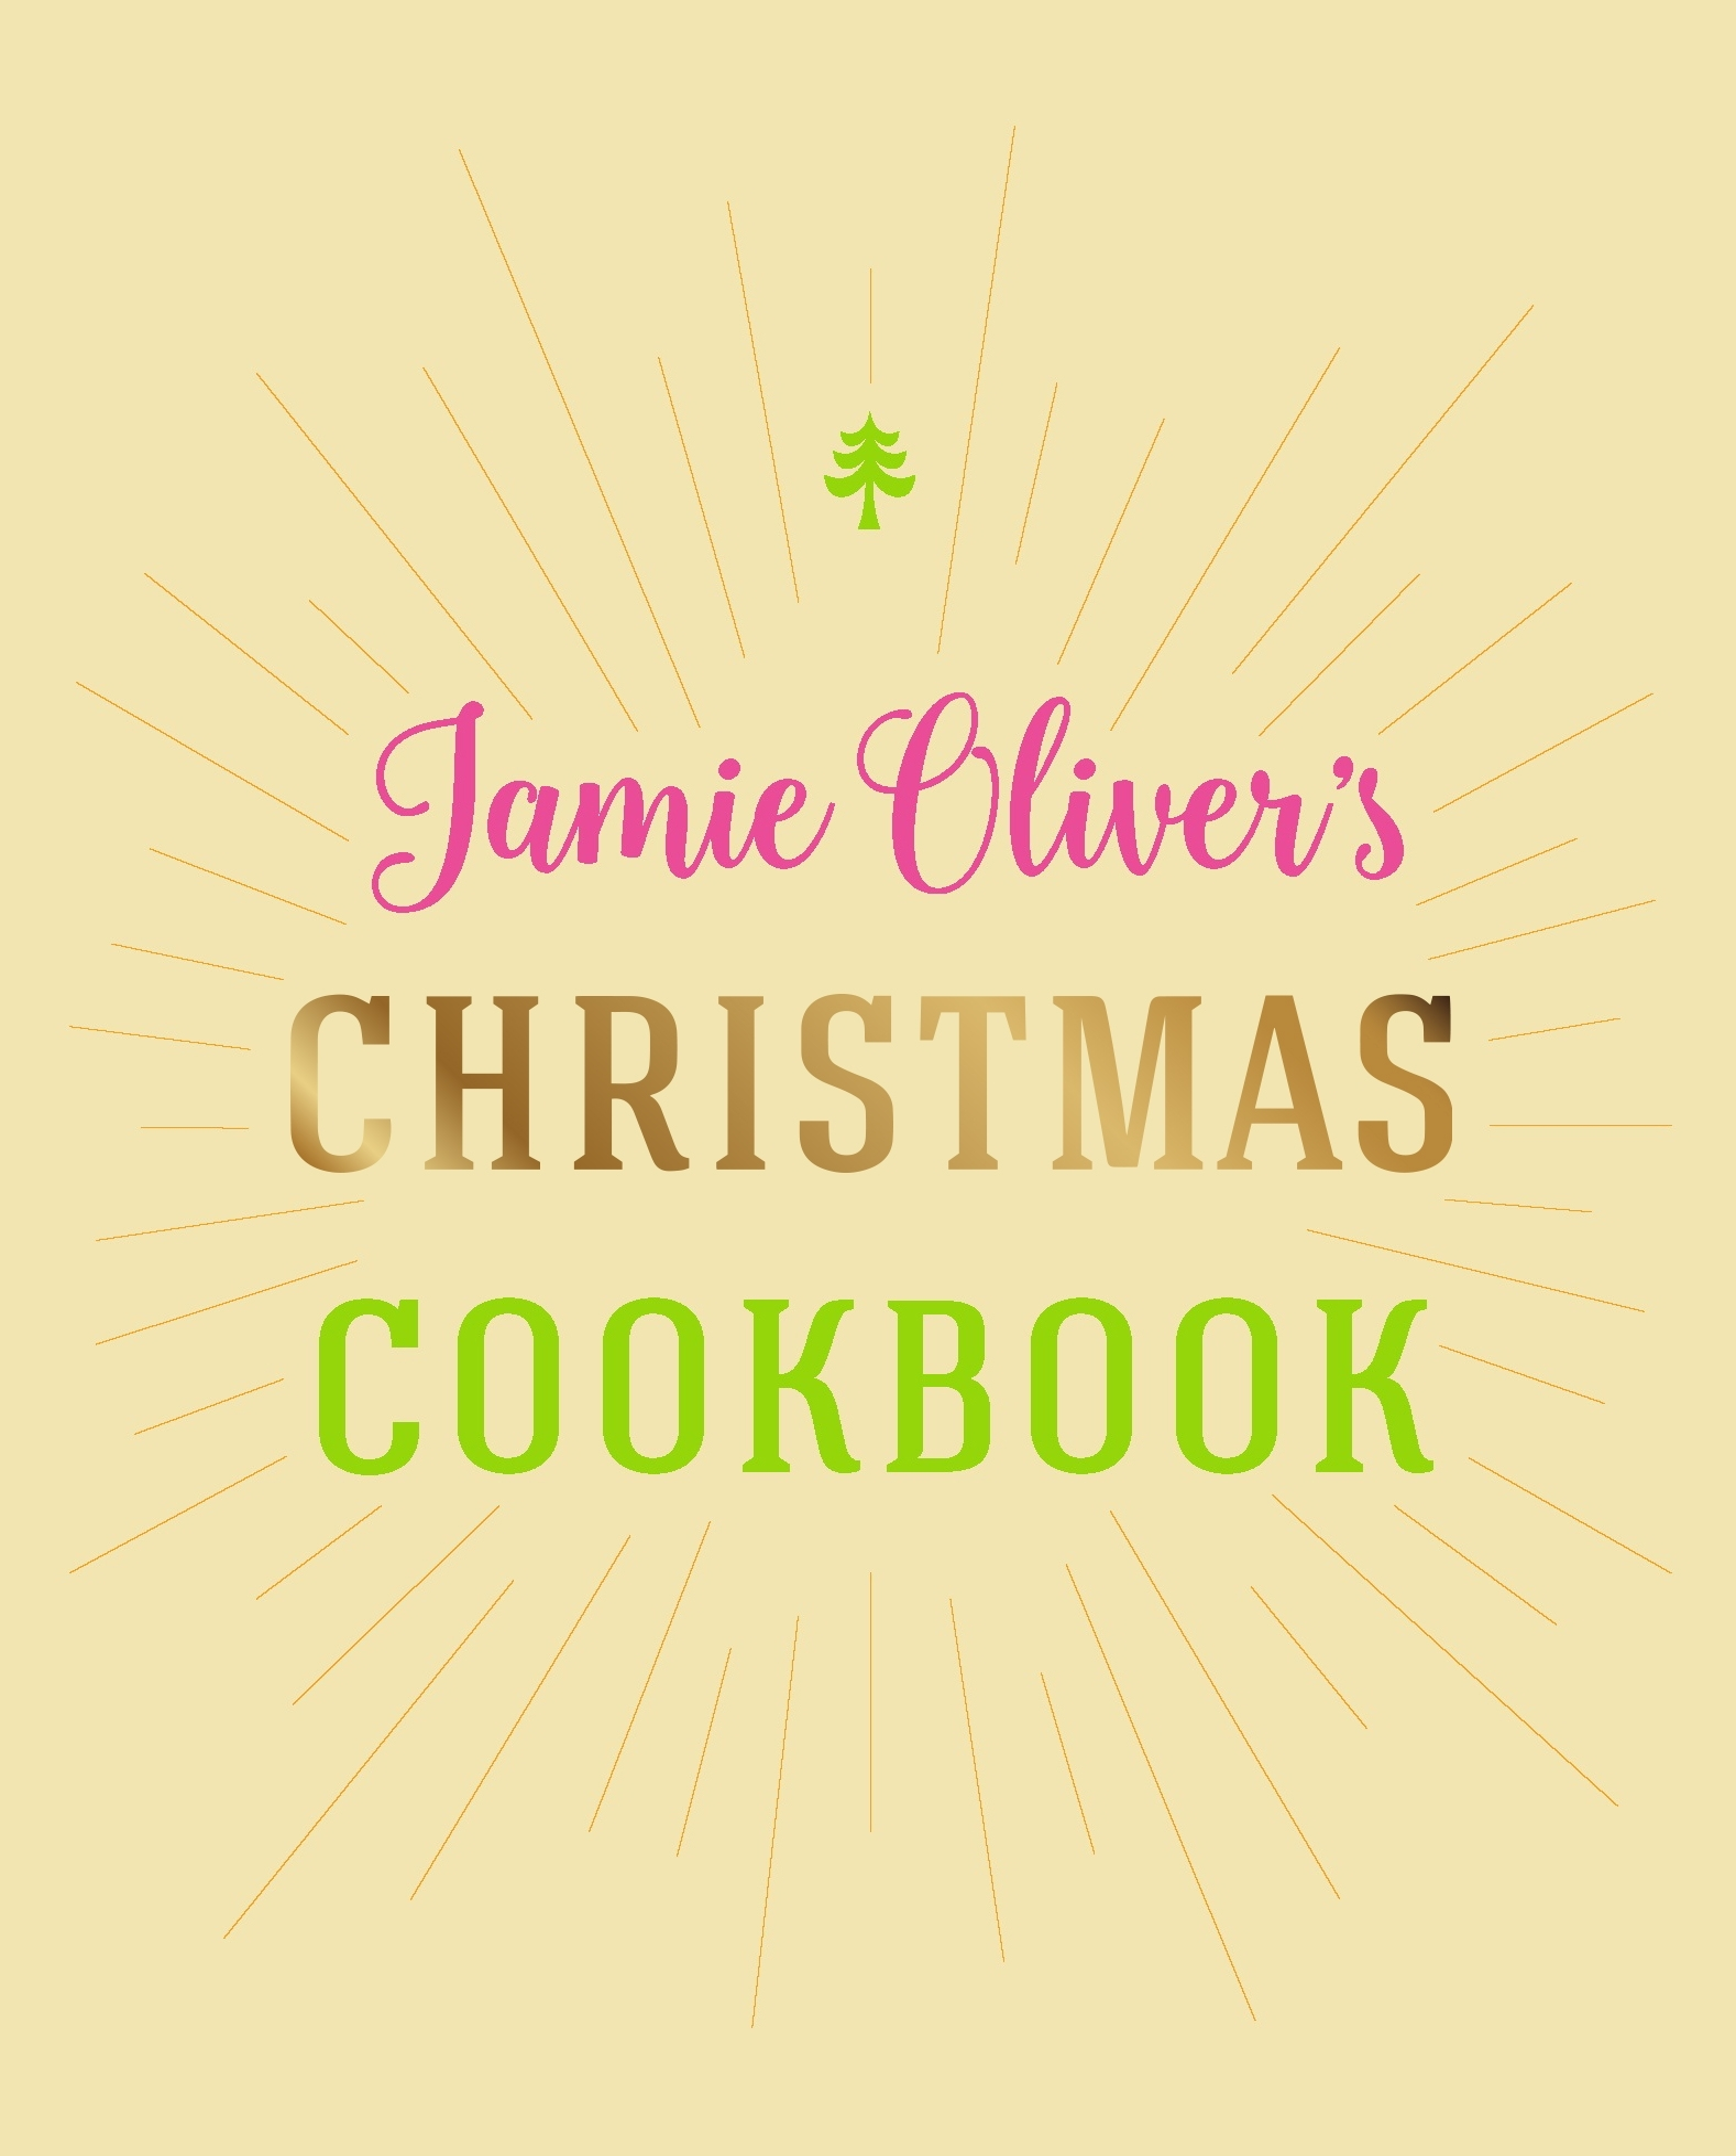 Jamie Oliver's Christmas Cookbook by Jamie Oliver - Penguin Books